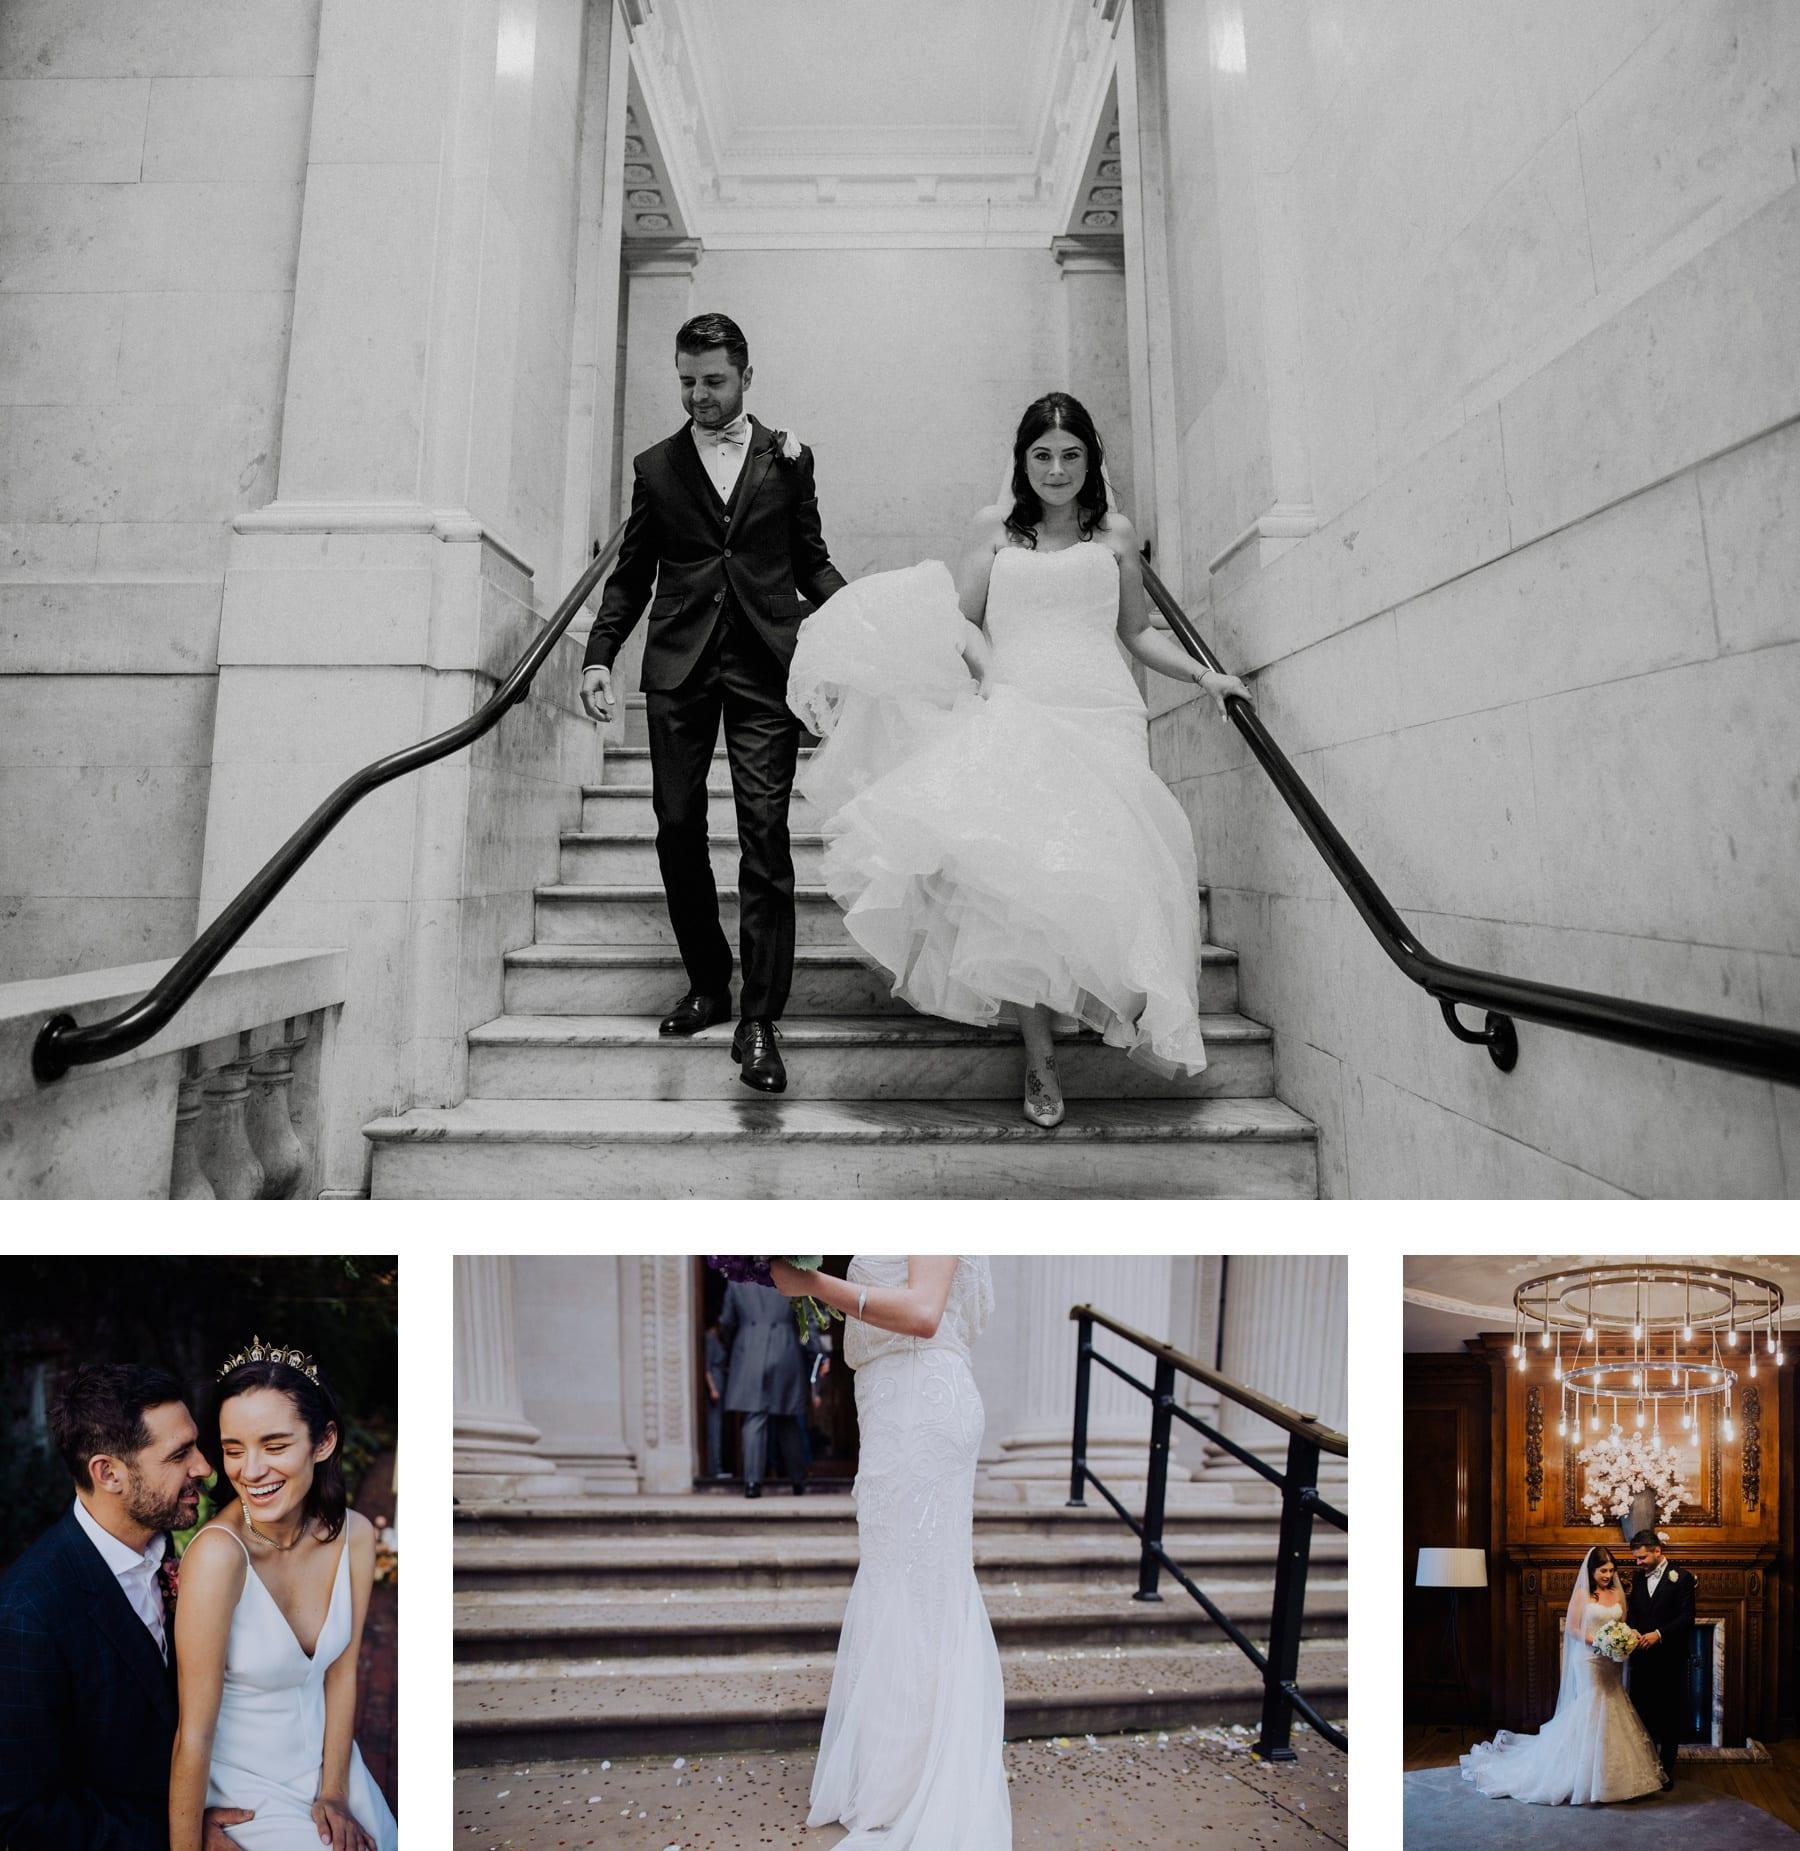 Wedding photos at Marylebone Town Hall